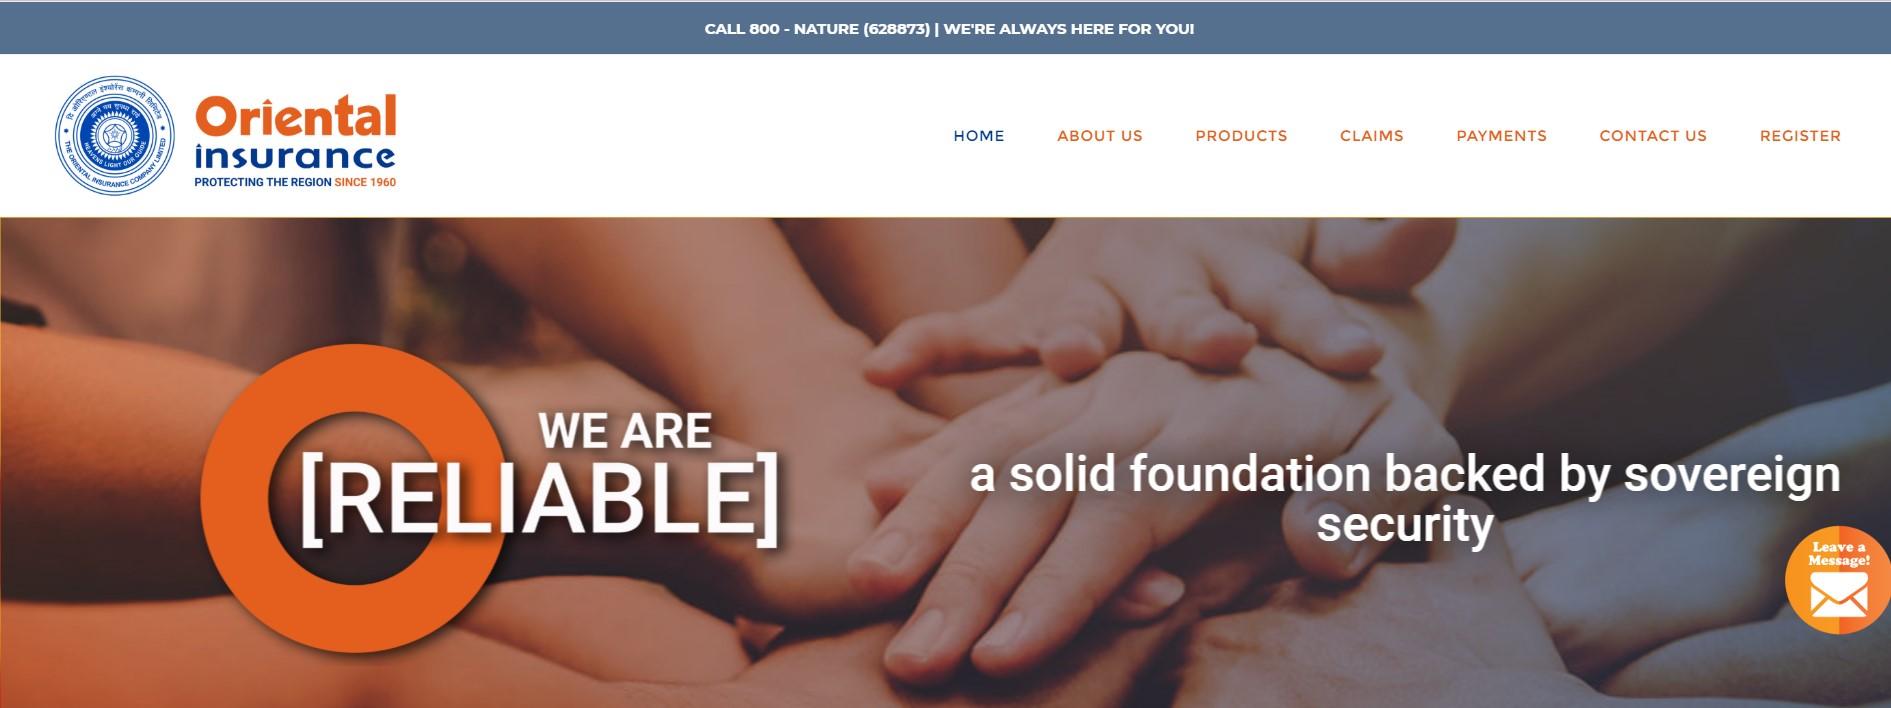 Al Fujairah National Insurance Co (AFNIC)